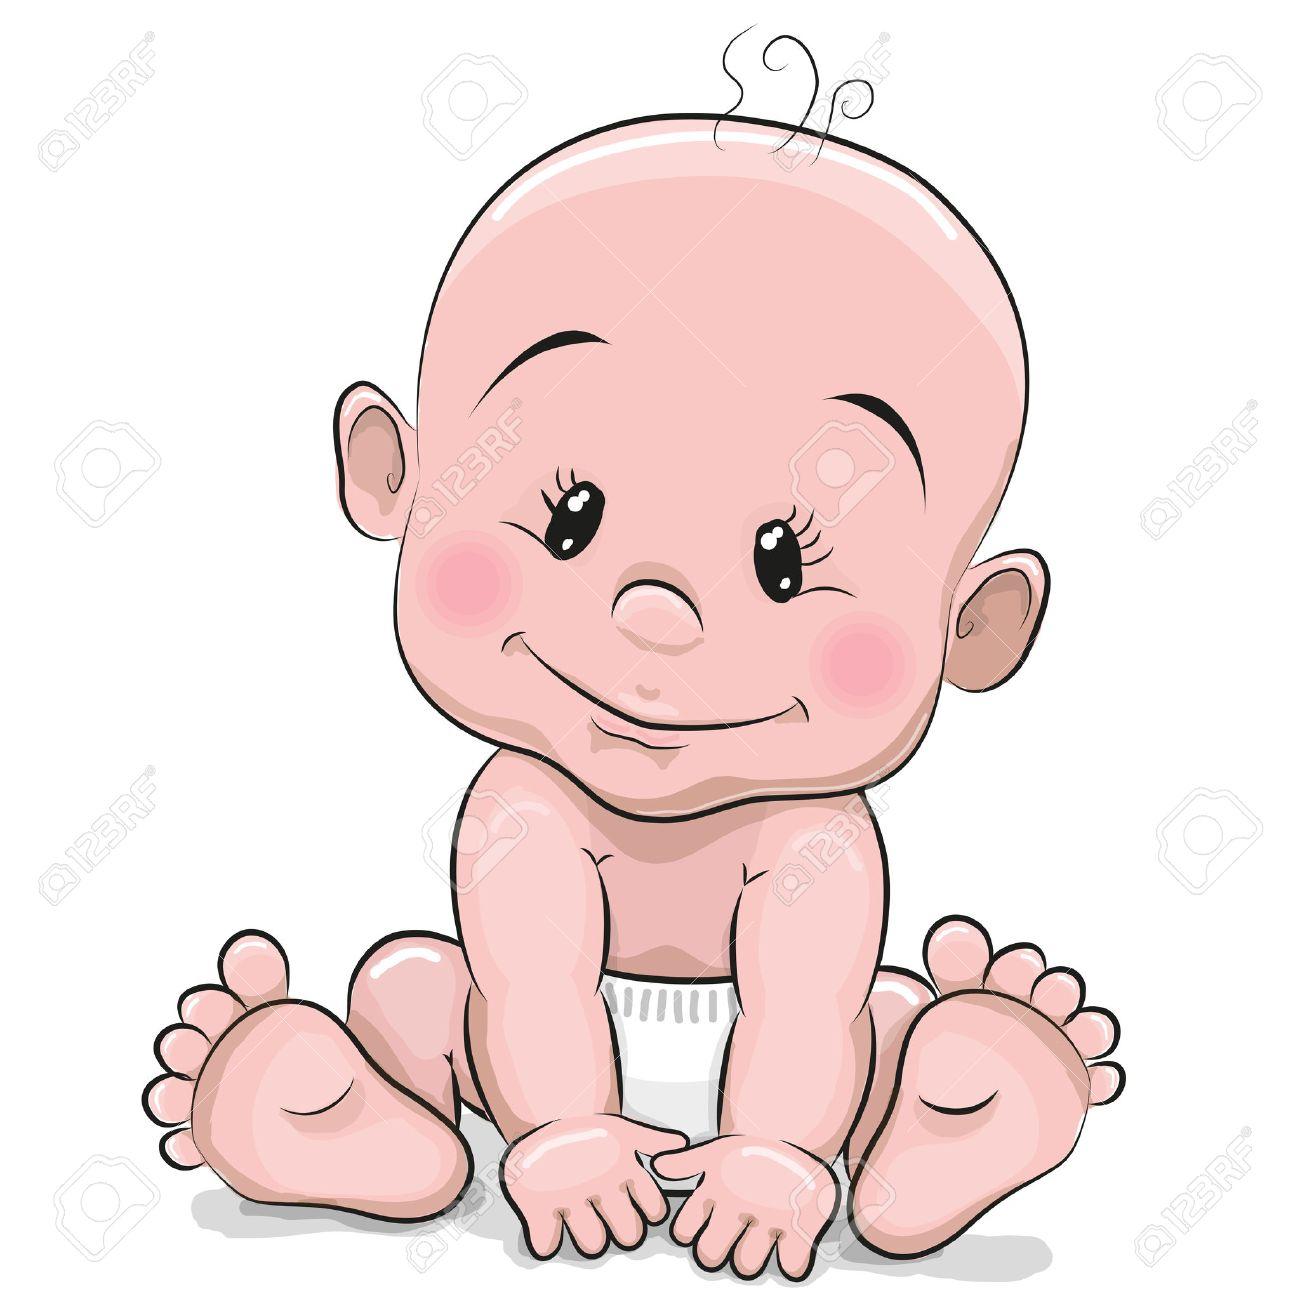 Dessin Bébé Garçon mignon dessin animé bébé garçon isolé sur un fond blanc clip art